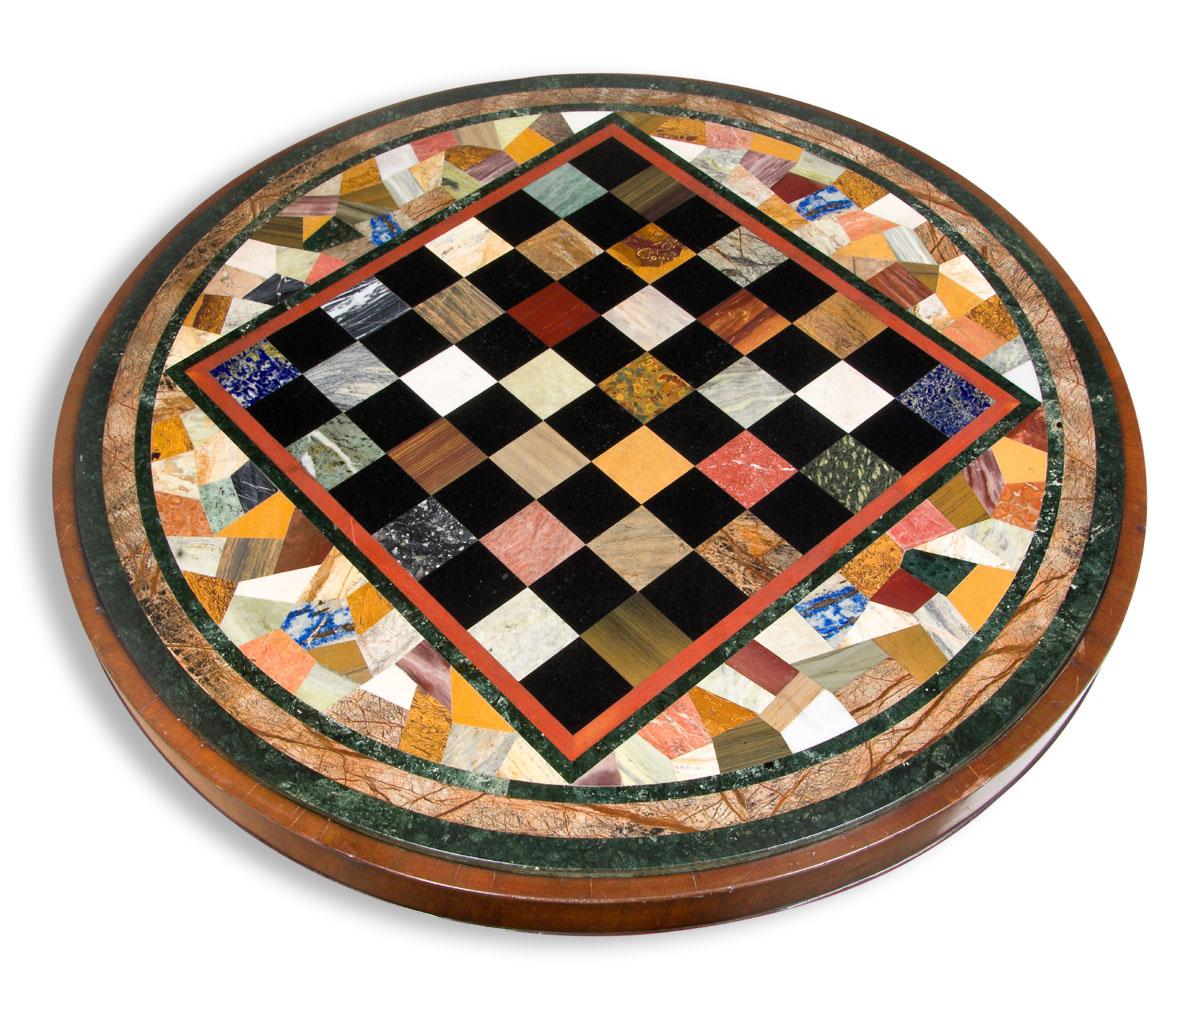 Marble Tile Chess Table circa 1890